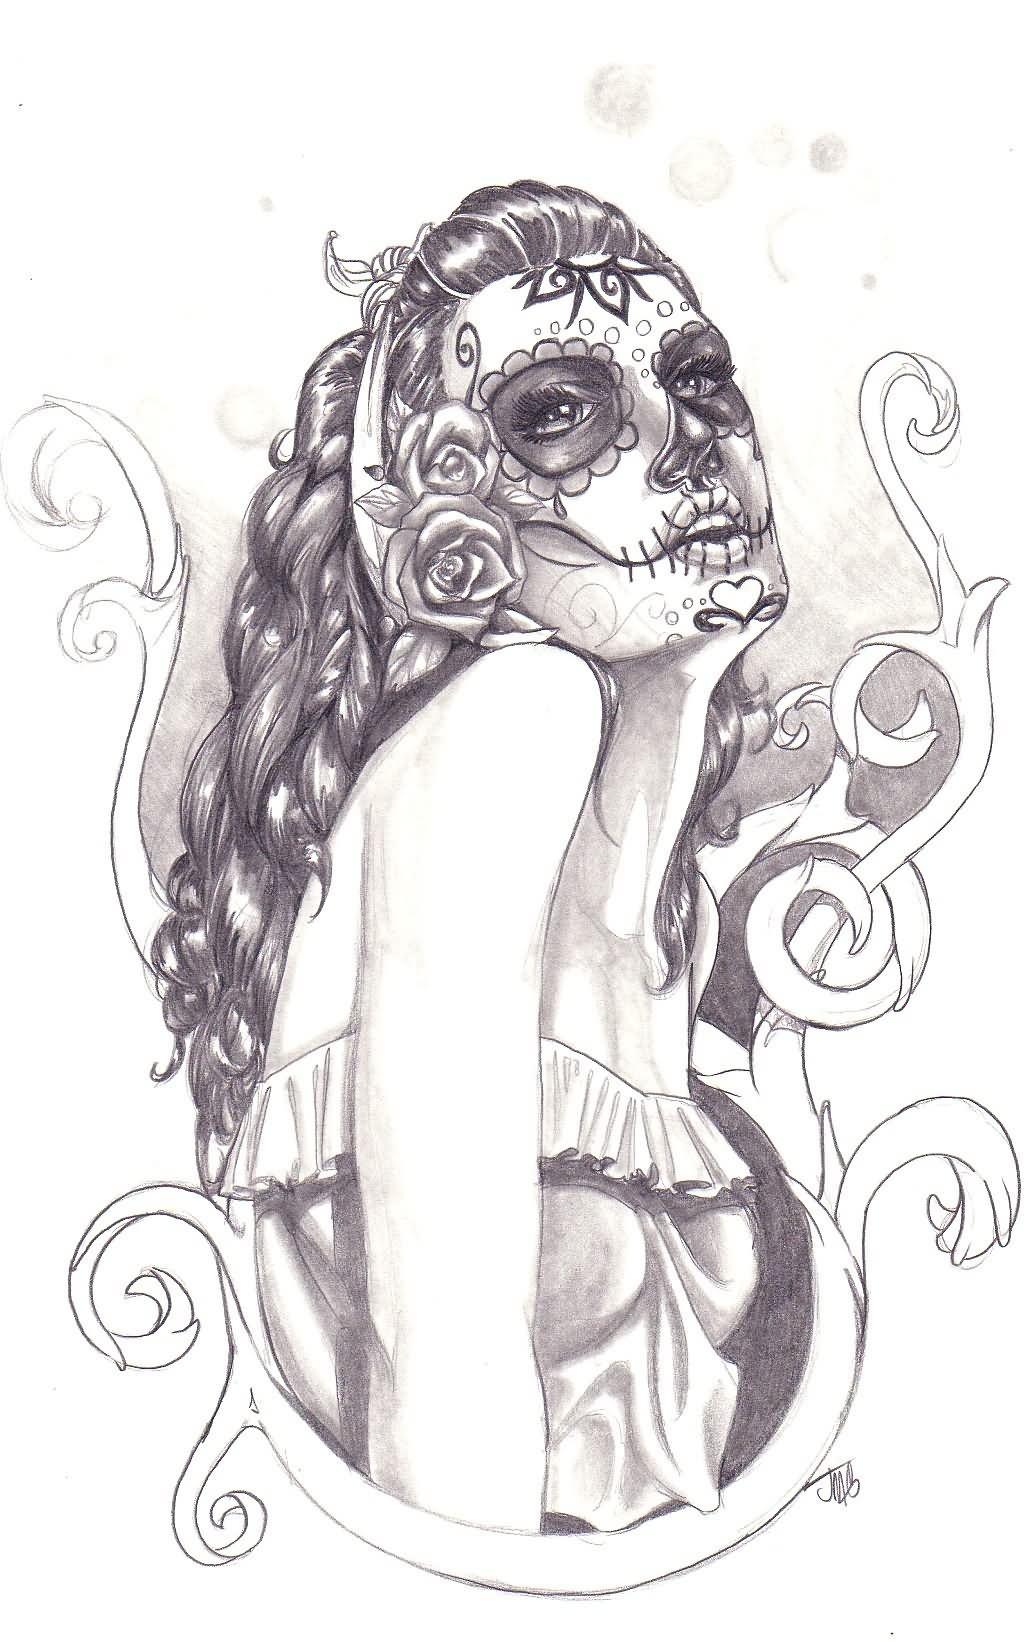 Tattoo pin up girls designs - Black And Grey Dia De Los Muertos Pin Up Girl Tattoo Design